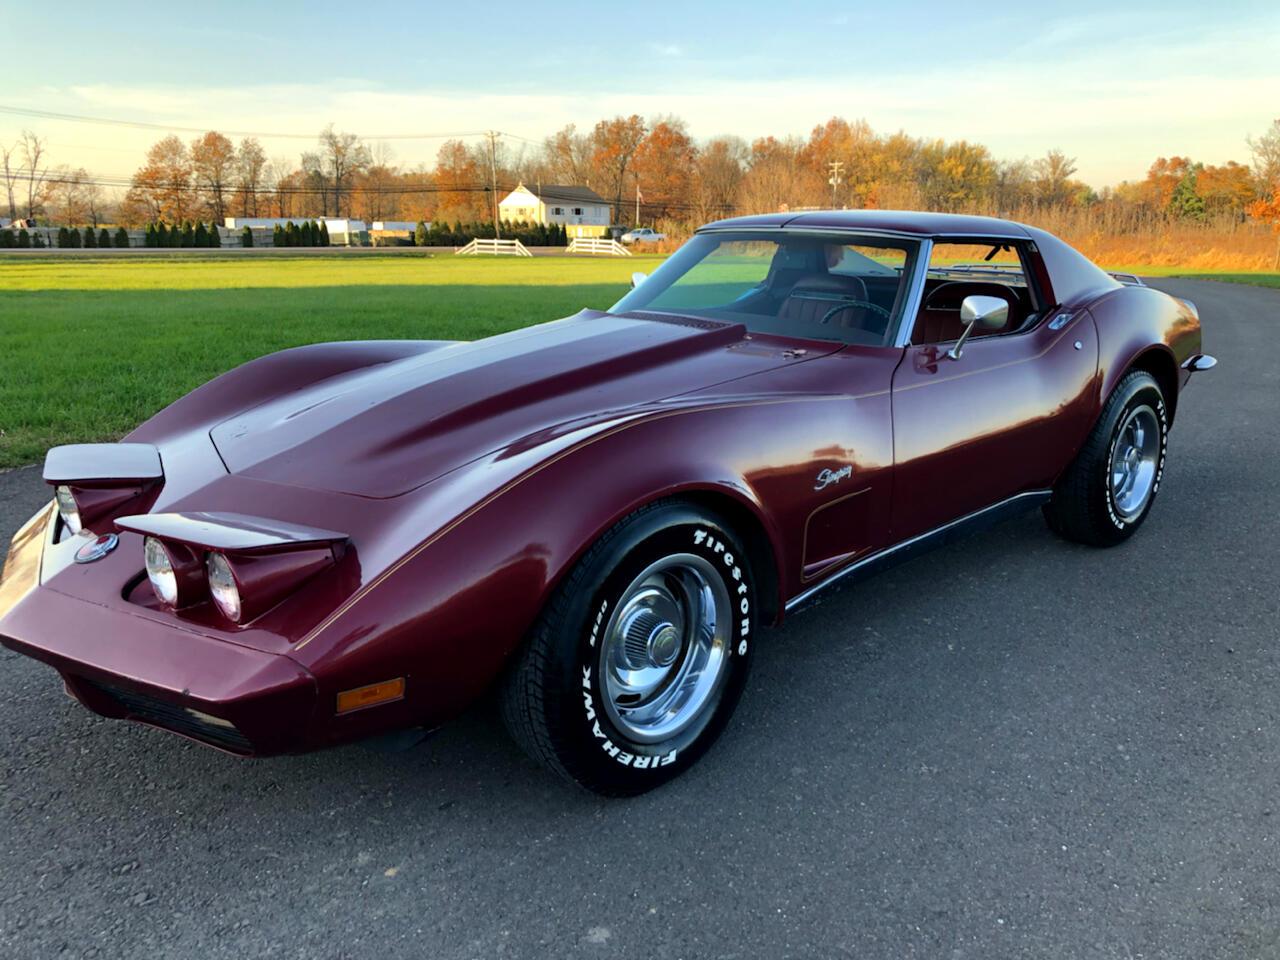 Kelebihan Corvette 1973 Harga